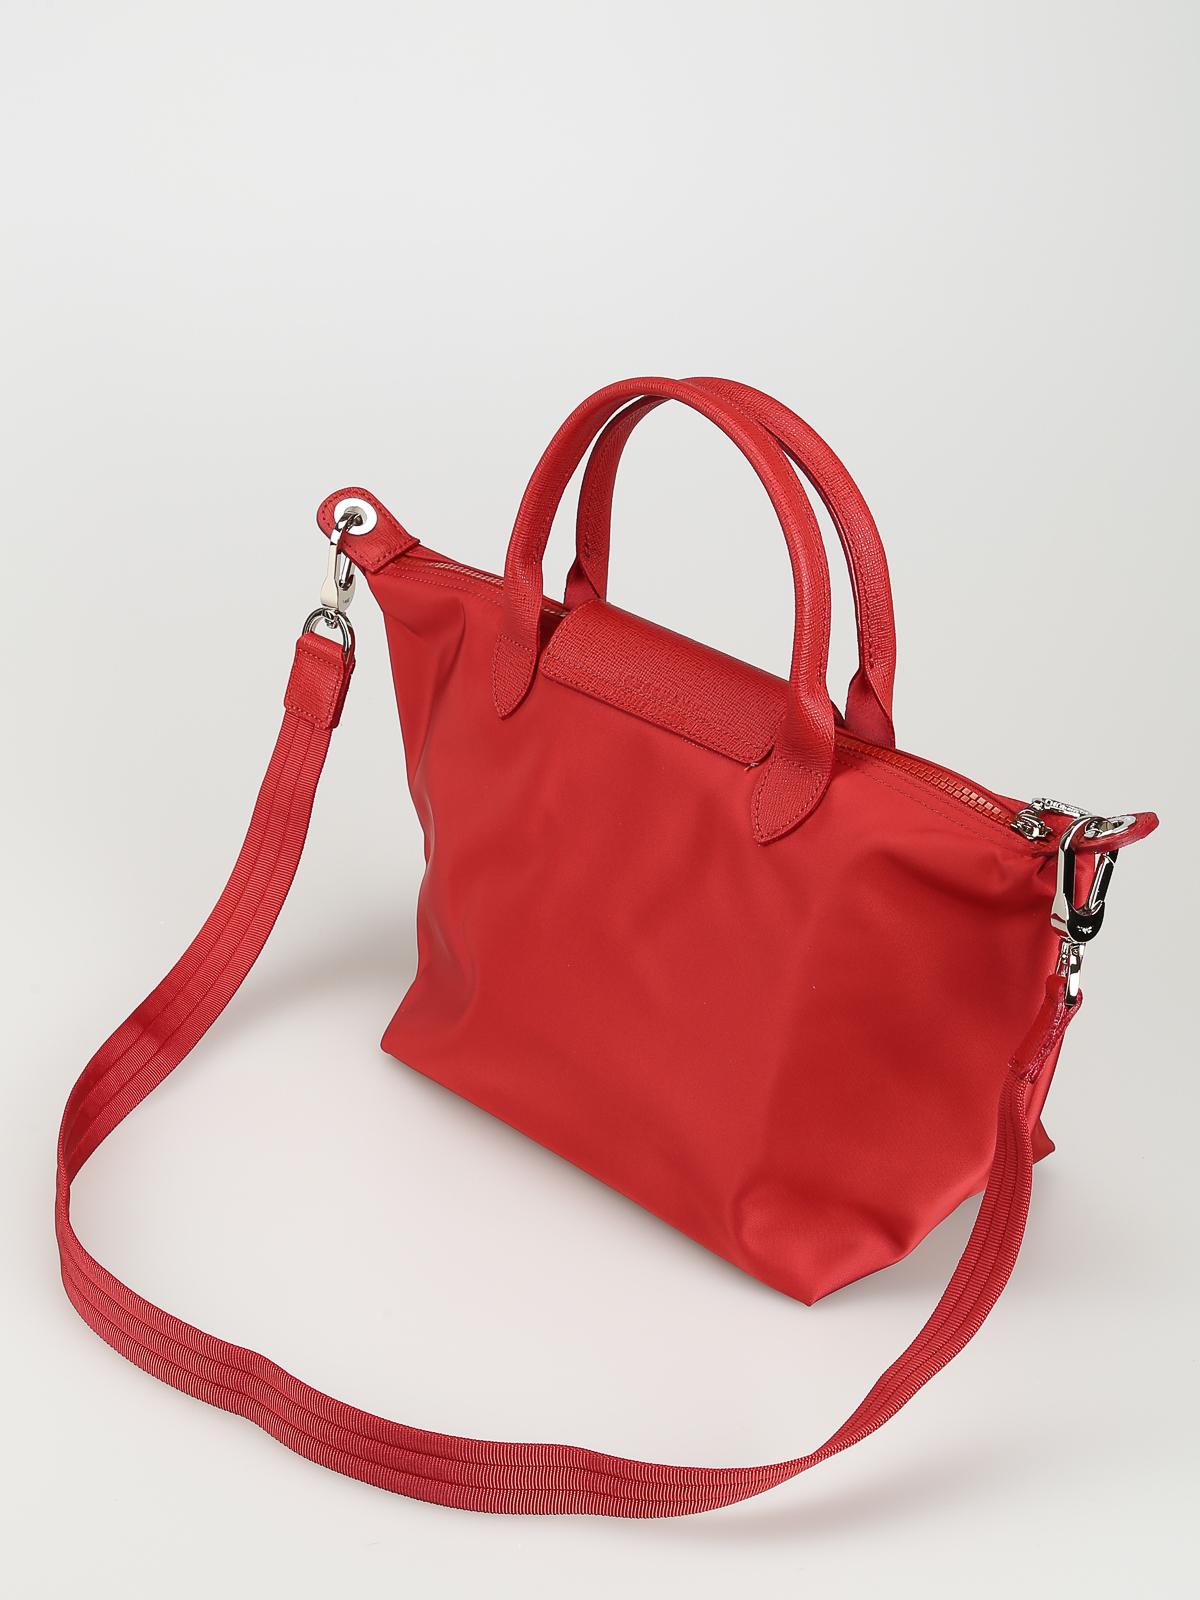 Longchamp - le Pliage Neo red nylon hand bag - totes bags - 1512578545